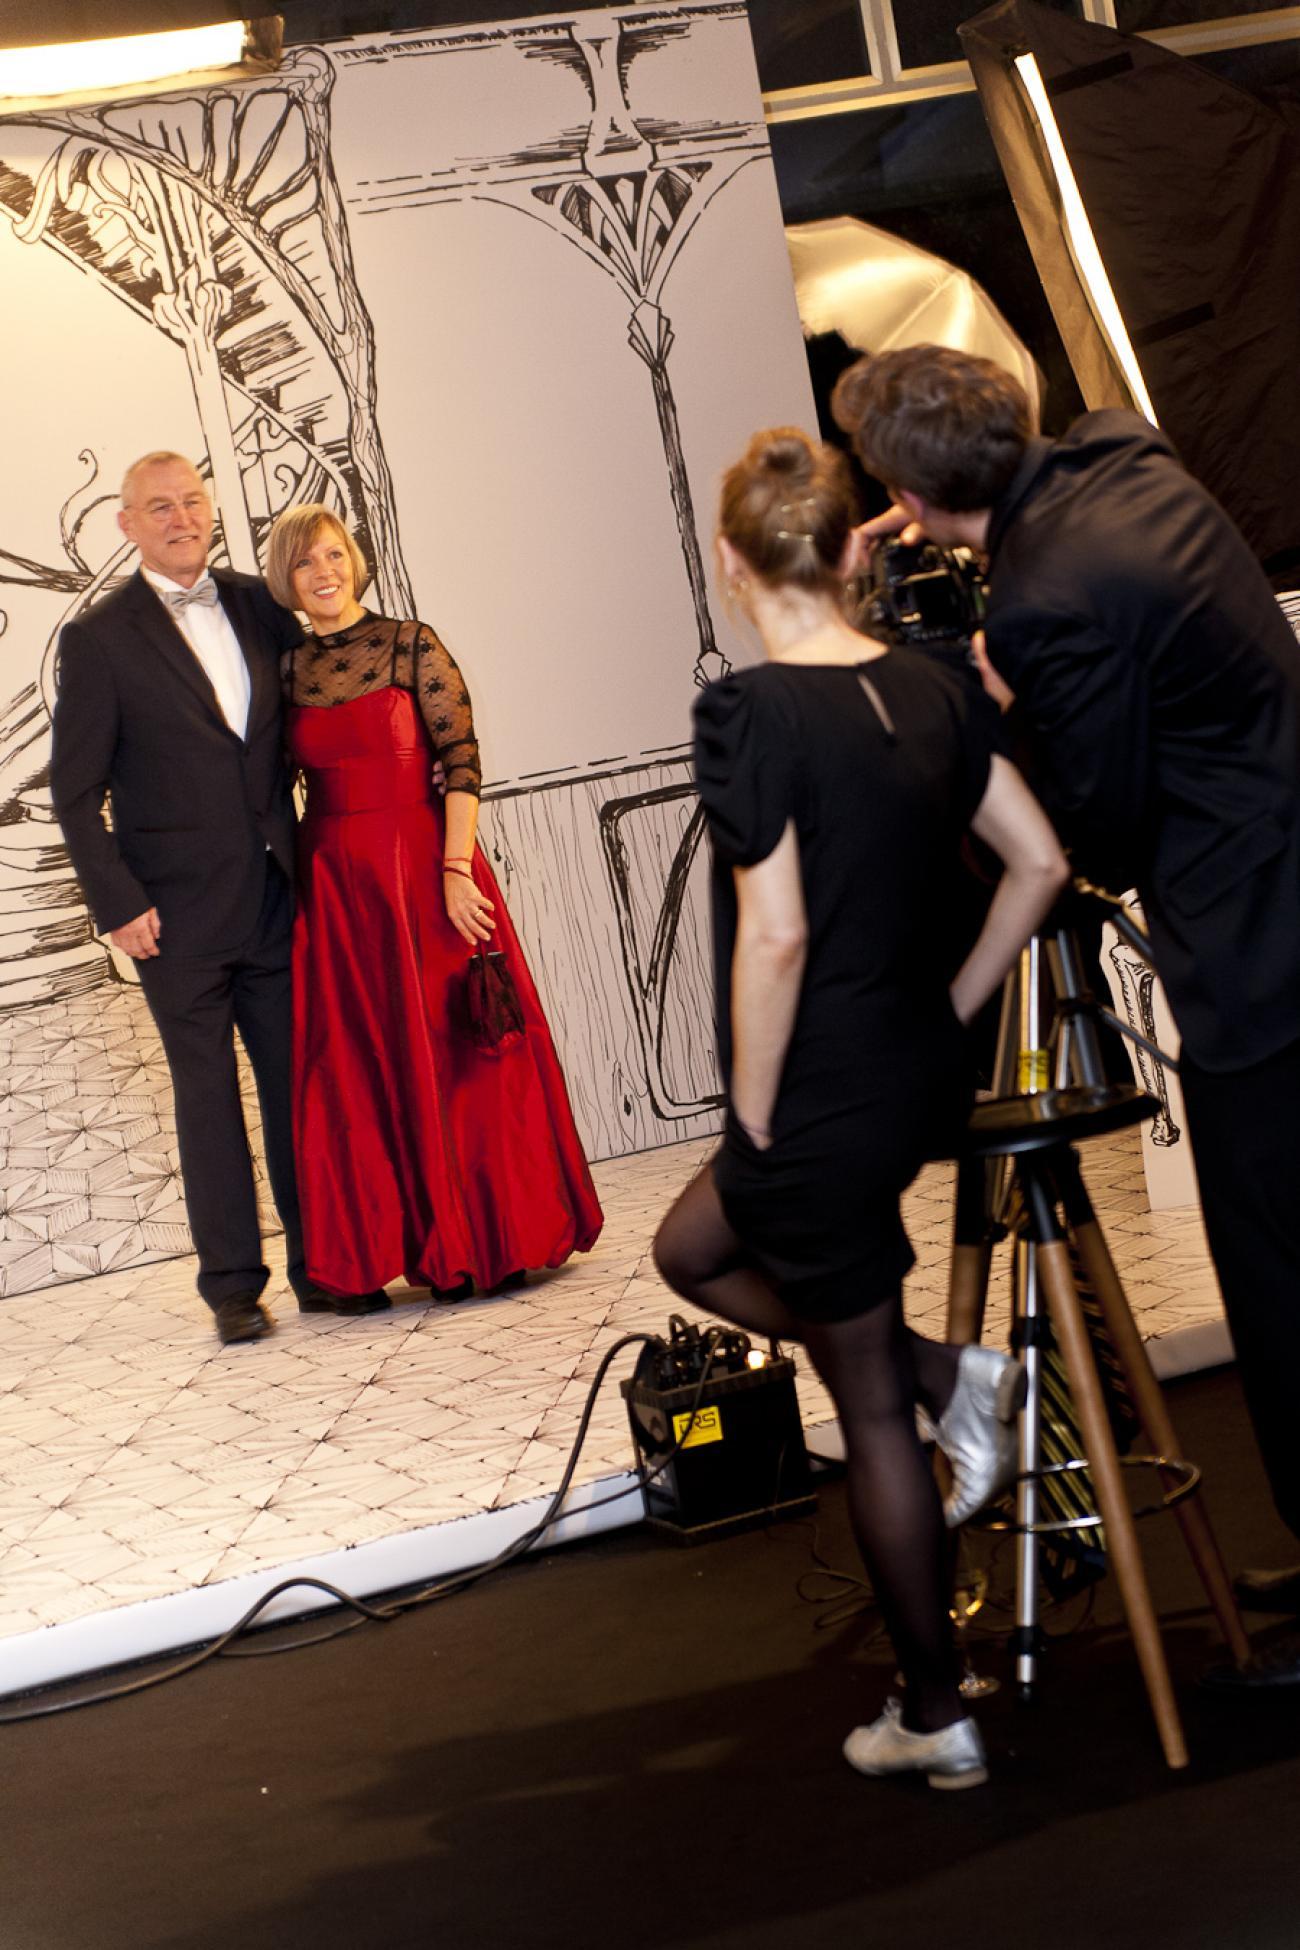 148 VBKI Ball Businessfotografie Inga Haar 2013?itok=lC8HL34Y